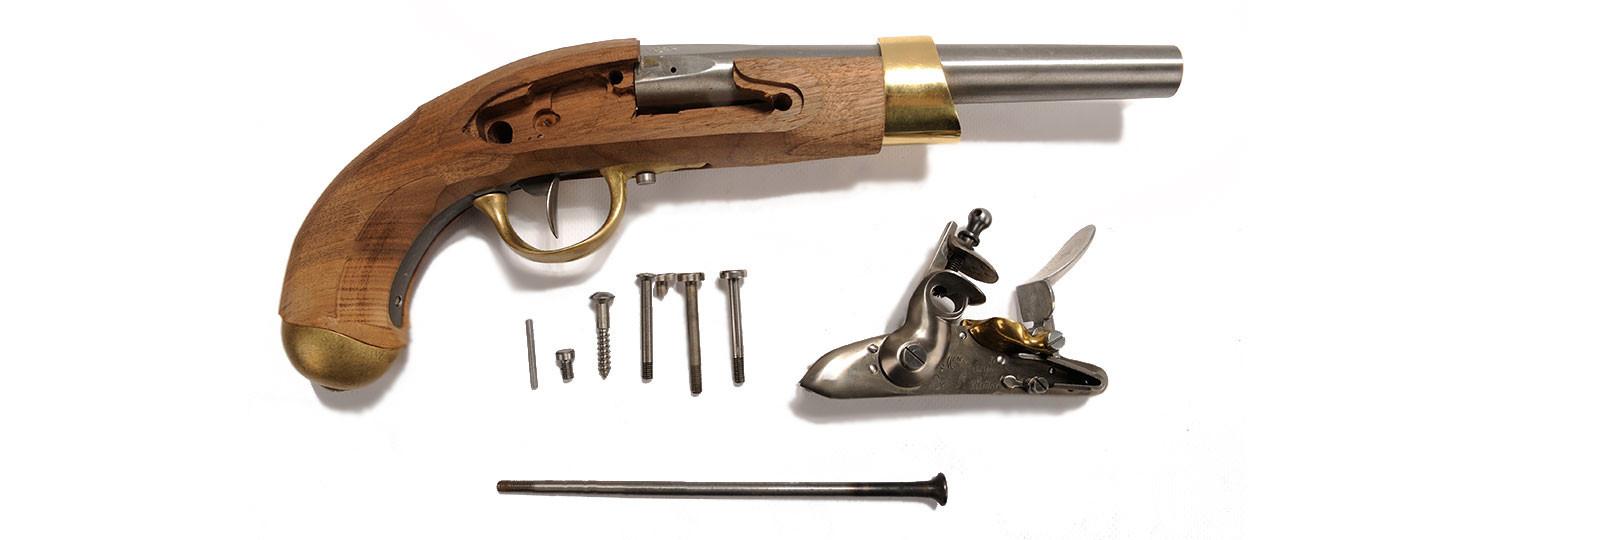 An XIII pistol kit